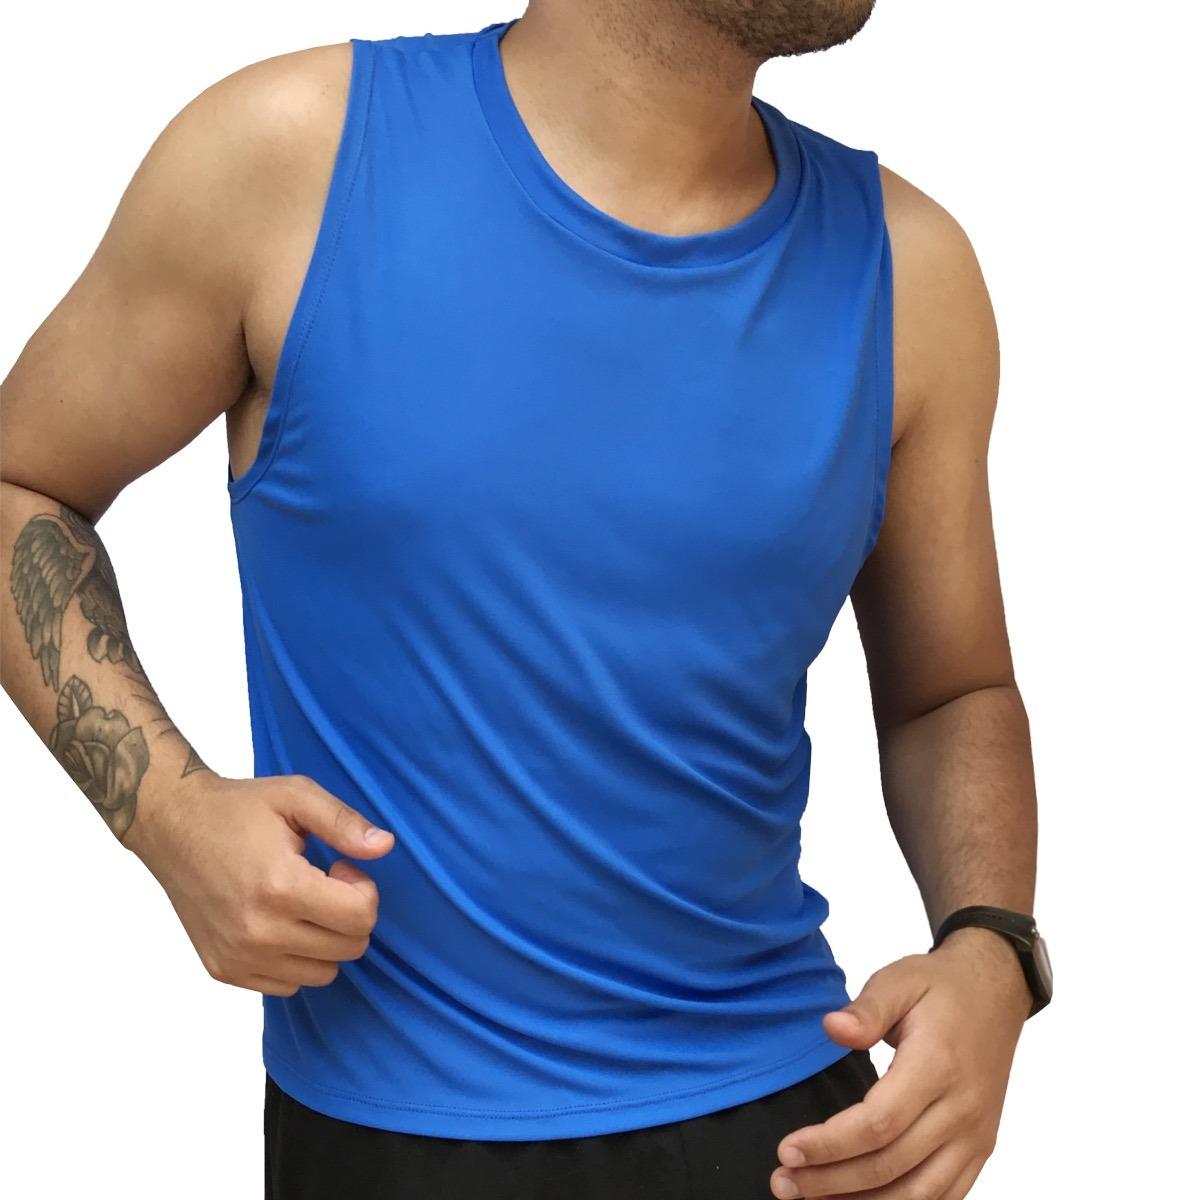 9 Camisetas Regata Masculina Dry Fit 100% Poliamida Fitness - R  197 ... e40345bb0d4